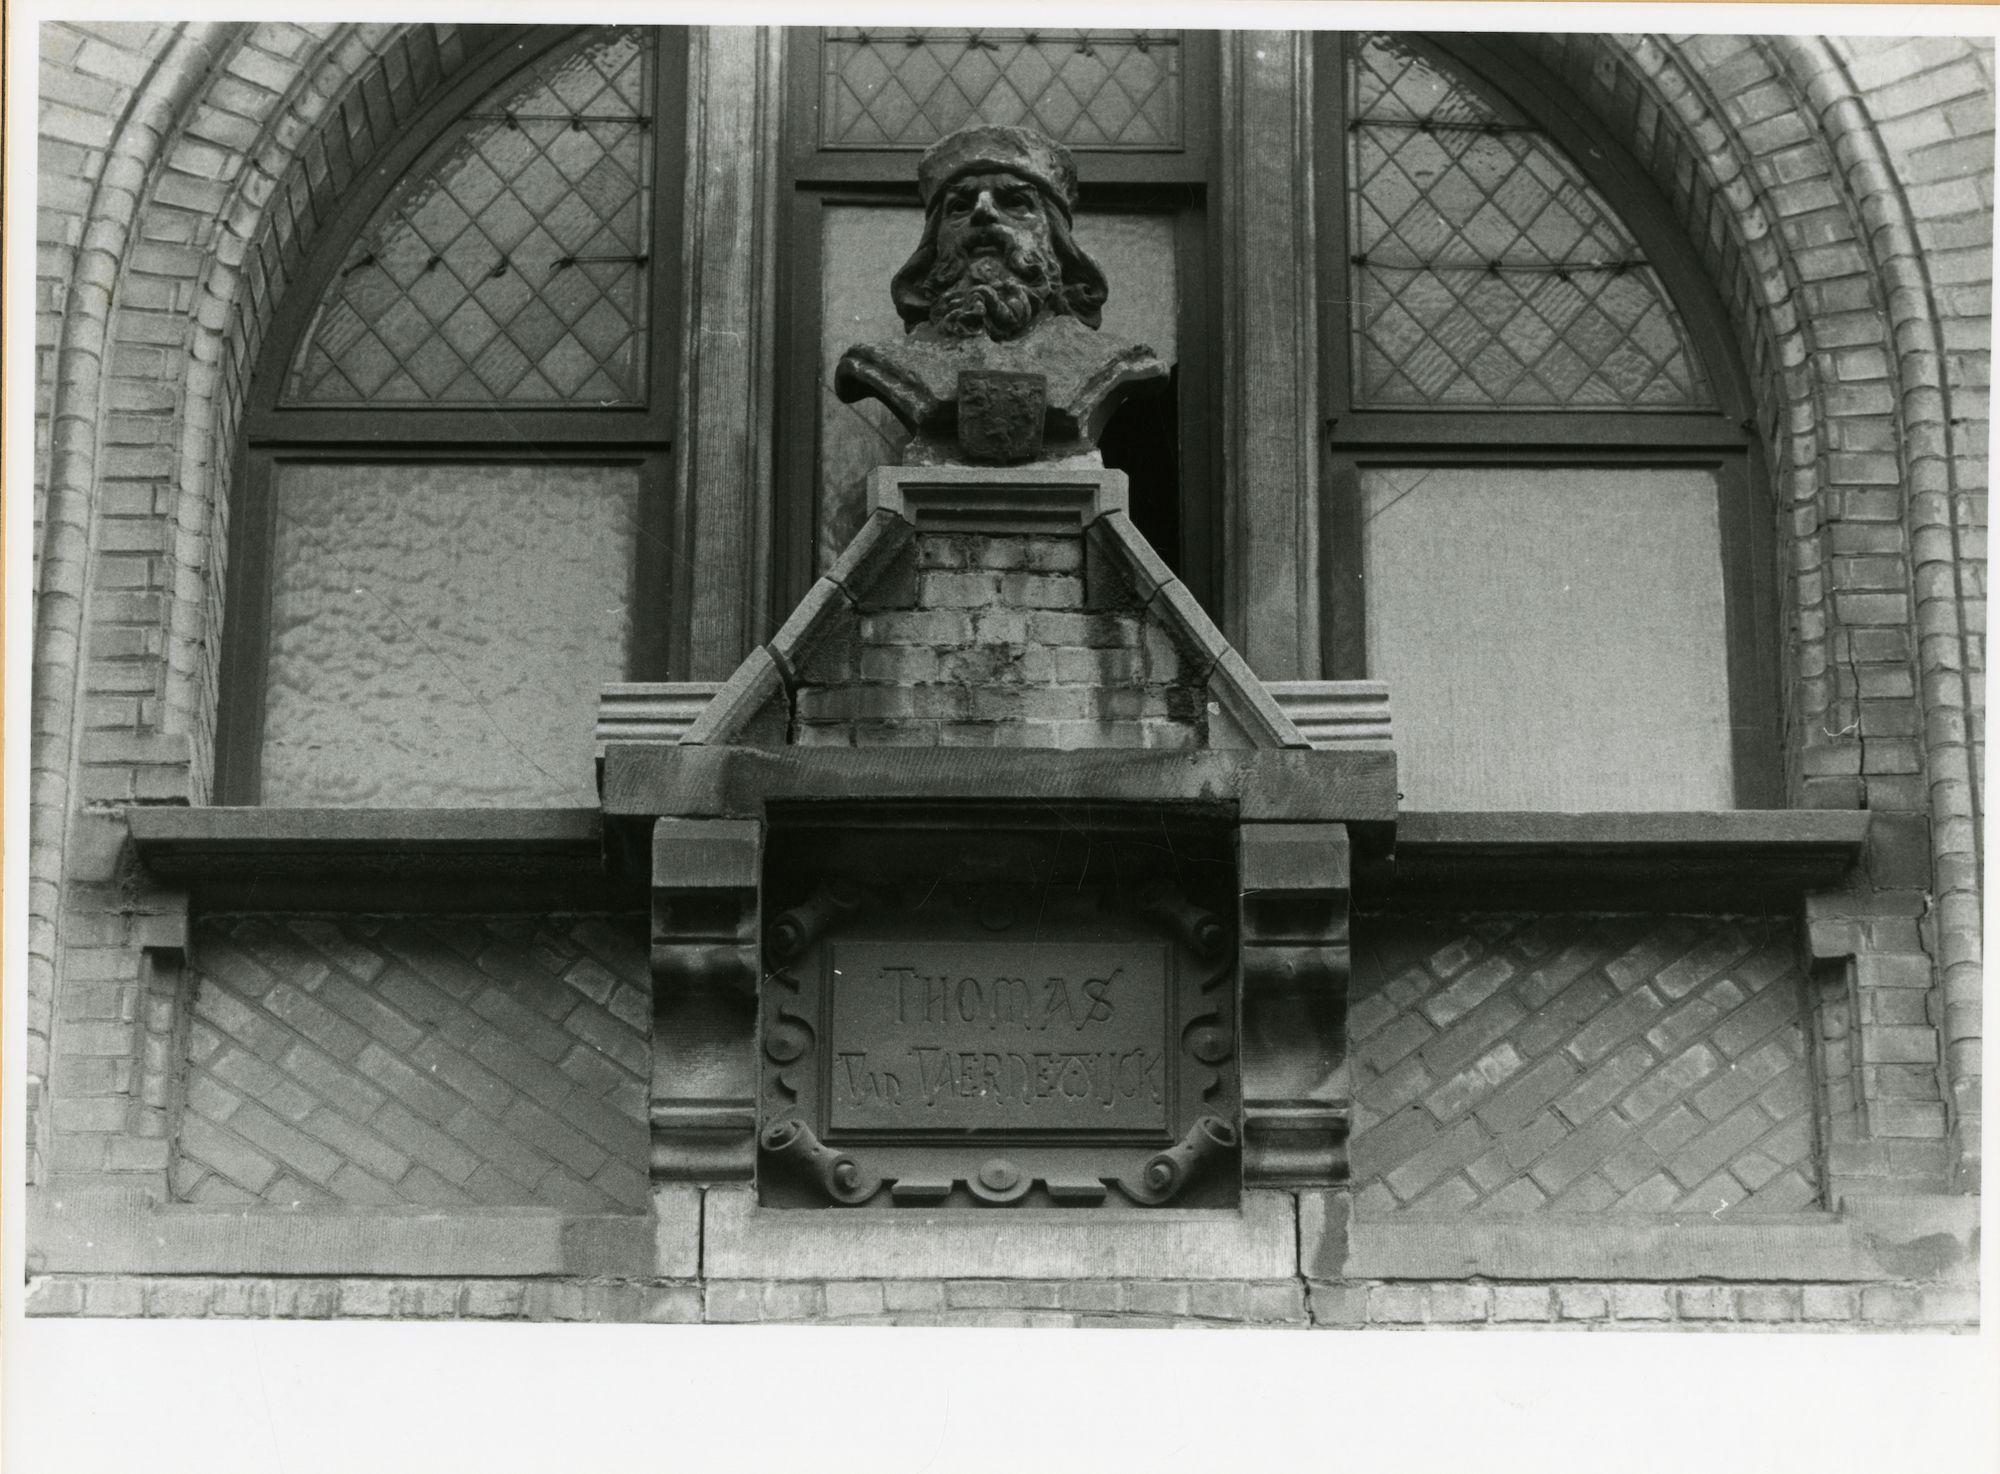 Gent: Belfortstraat: buste: Thomas Van Vaernewijck, 1979